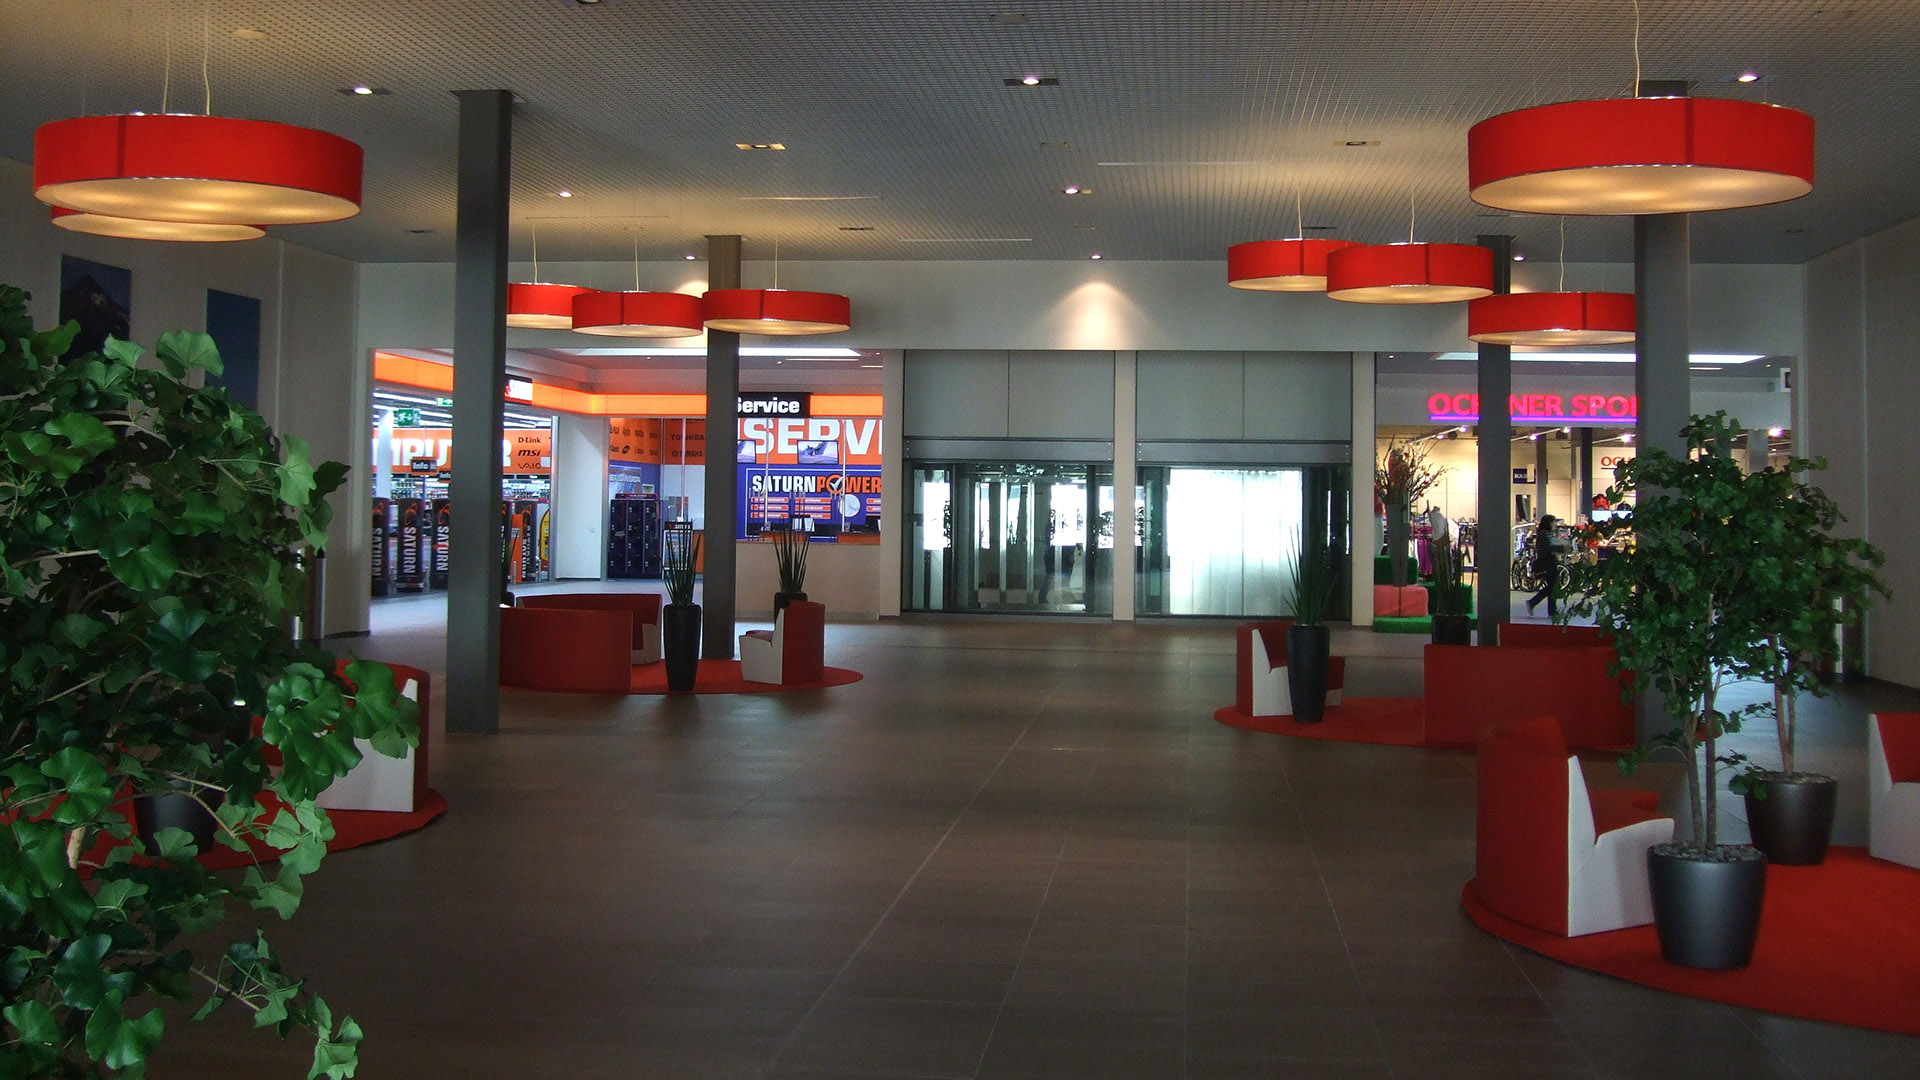 Panorama center thun raumgestaltung metazona ag for Beratung raumgestaltung